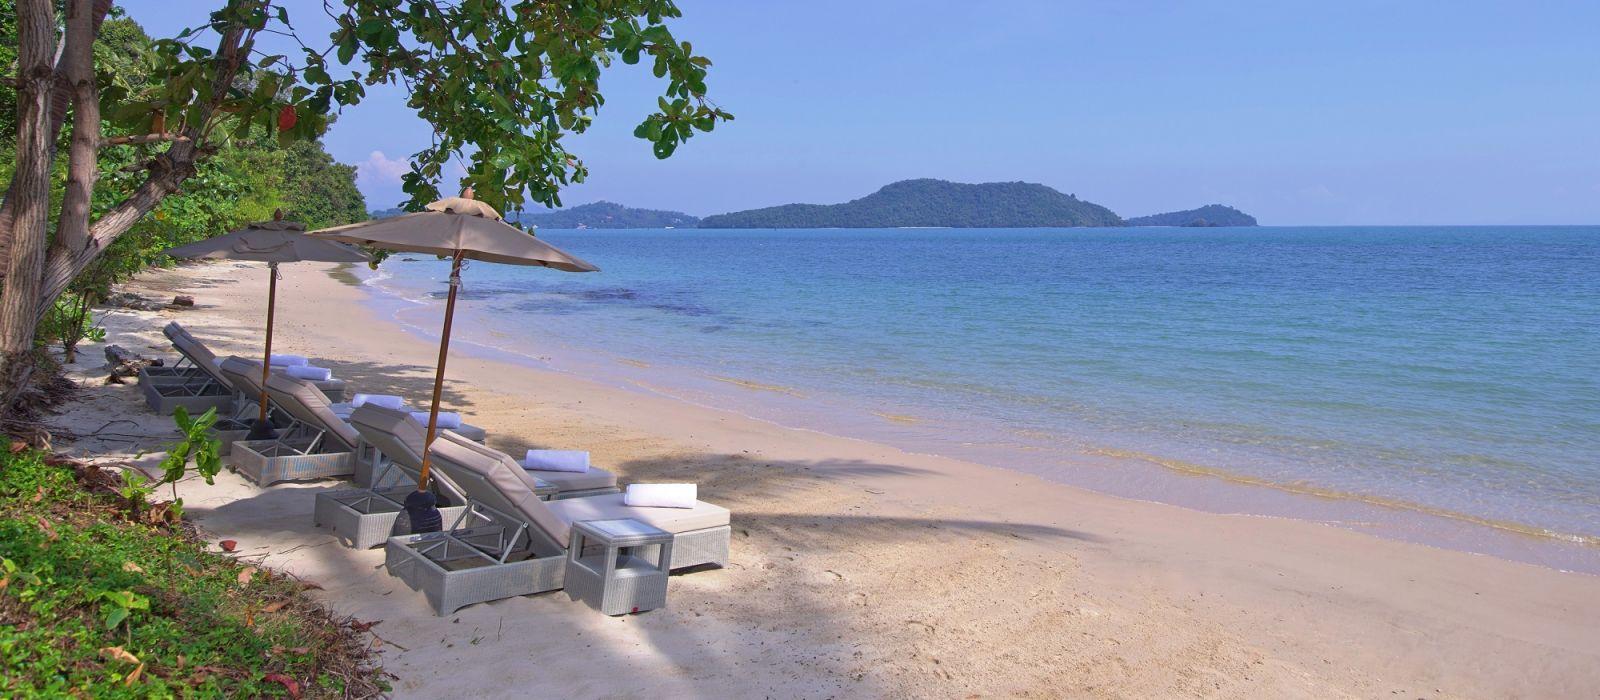 Luxury Spa Getaway in Thailand Tour Trip 1